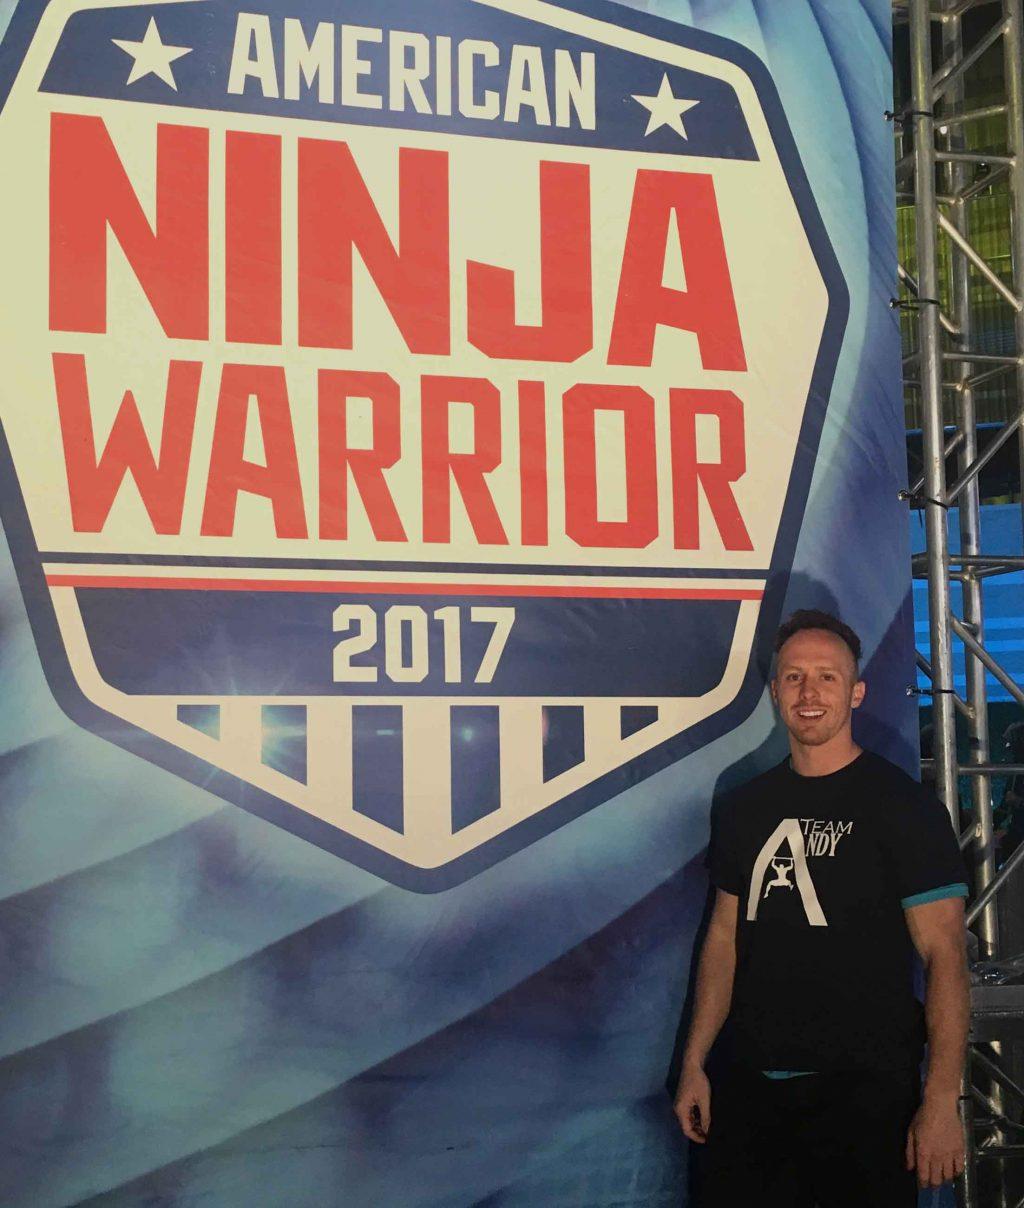 Warriors Into The Wild Christian Review: Church Member Falls Short On American Ninja Warrior